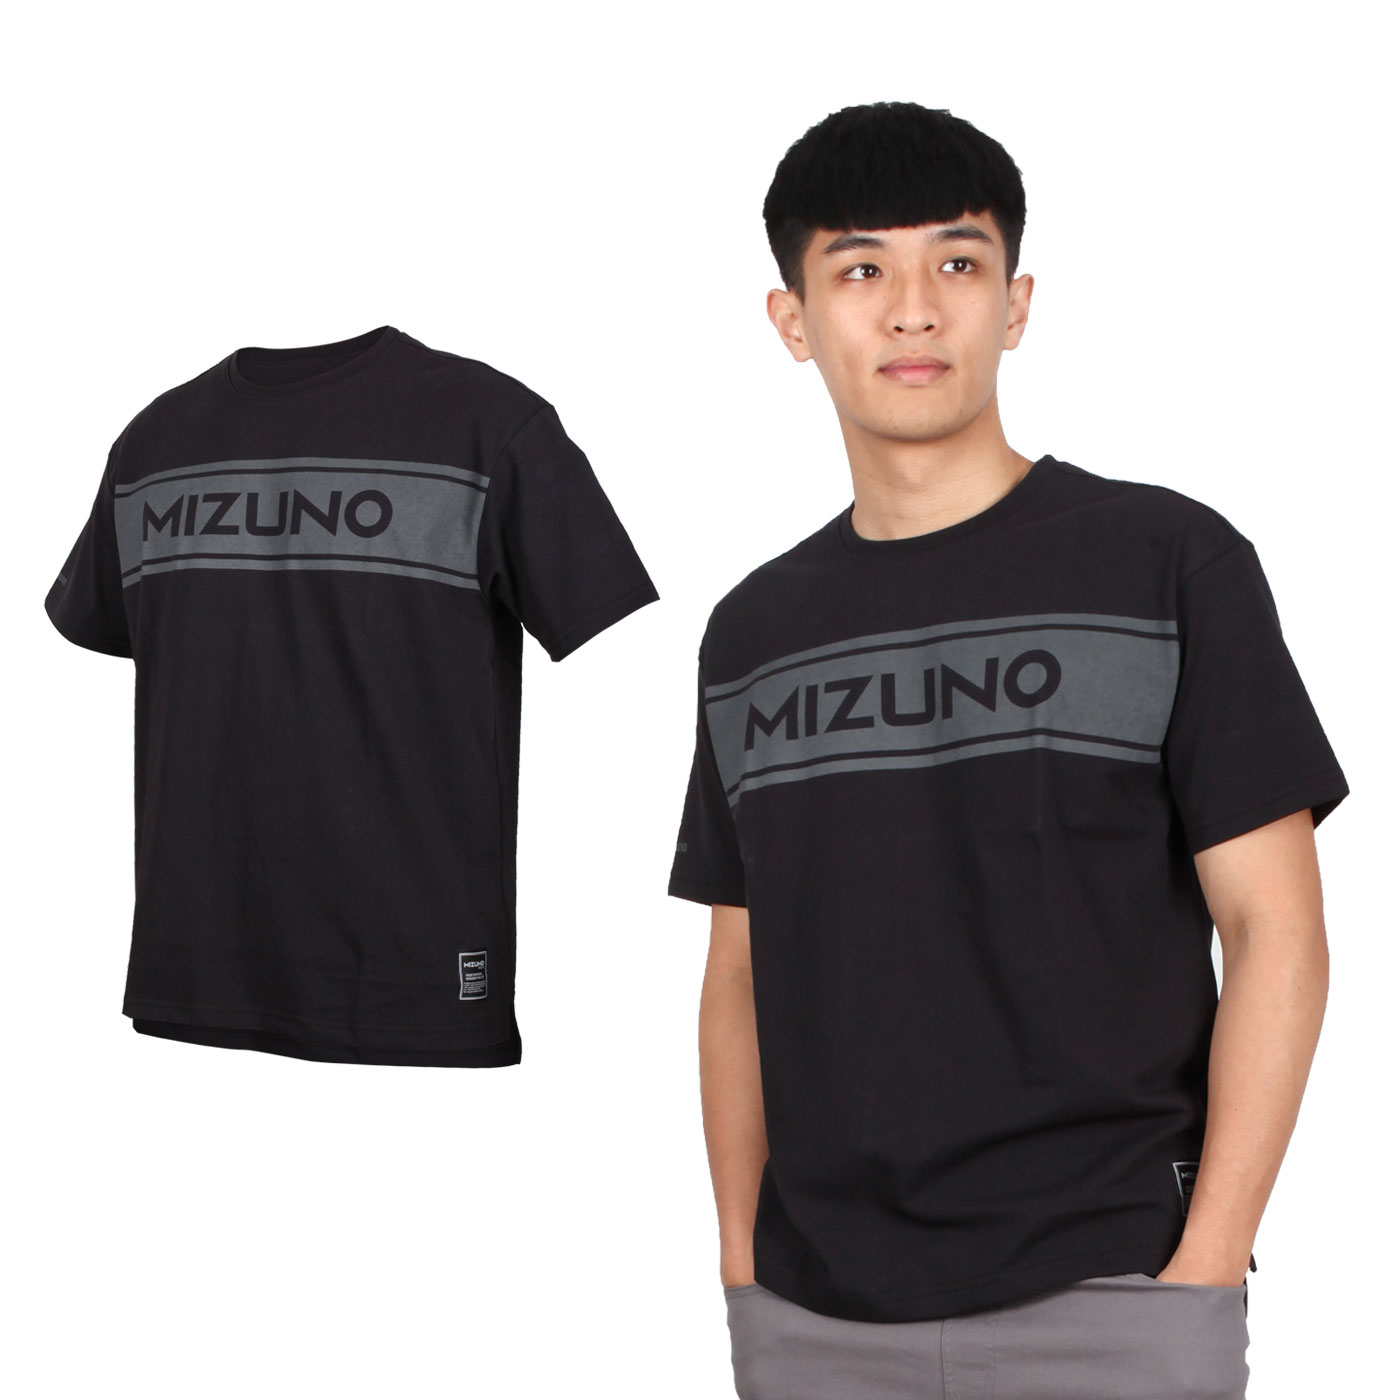 MIZUNO 男款1906系列短袖T恤 D2TA000301 - 黑灰